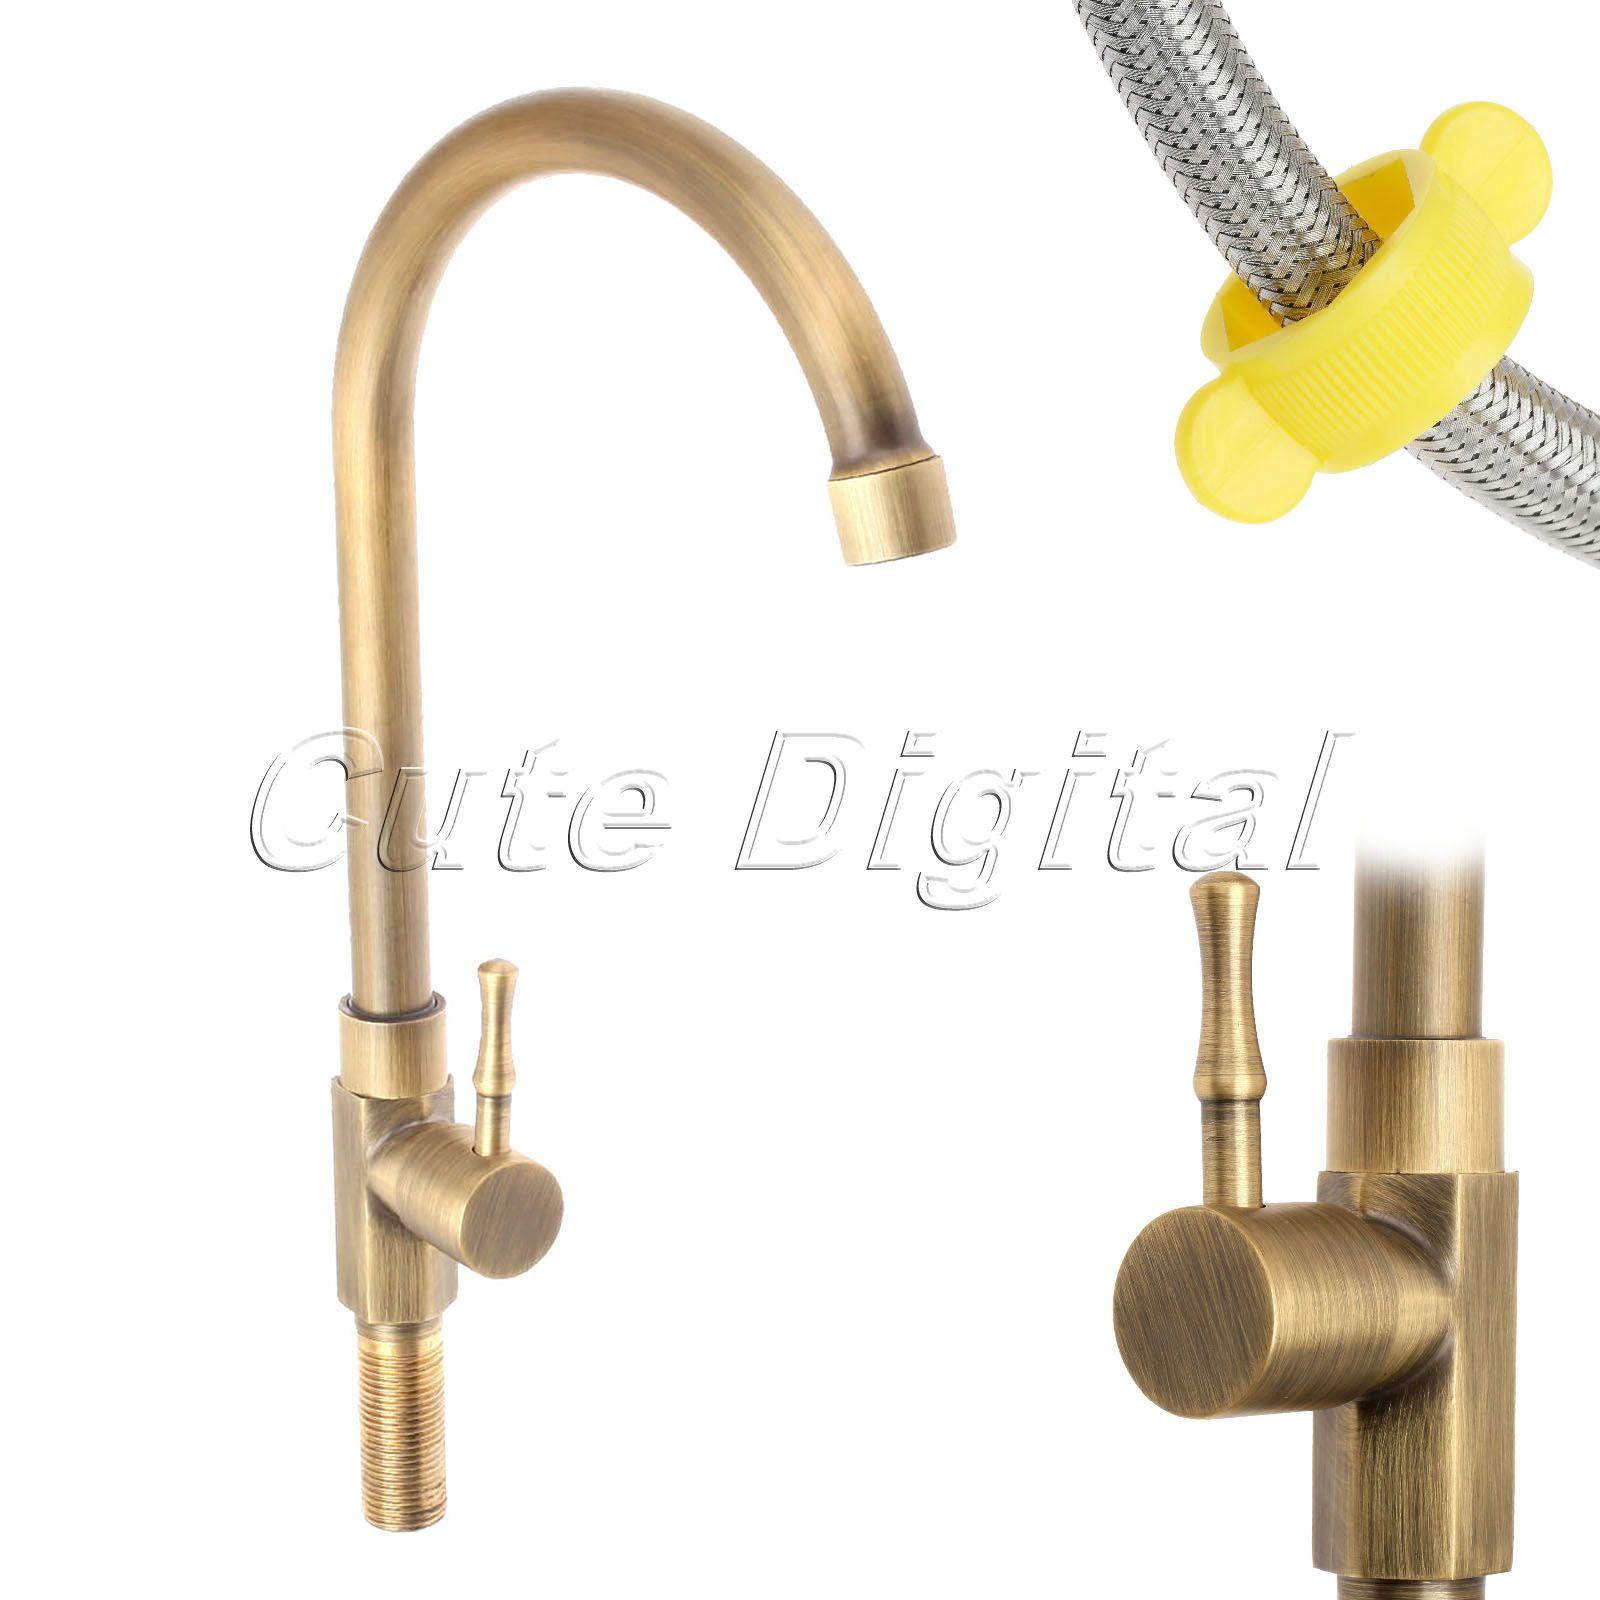 Antique Brass Luxury Bathroom Sink Faucet Single Handle Swivel